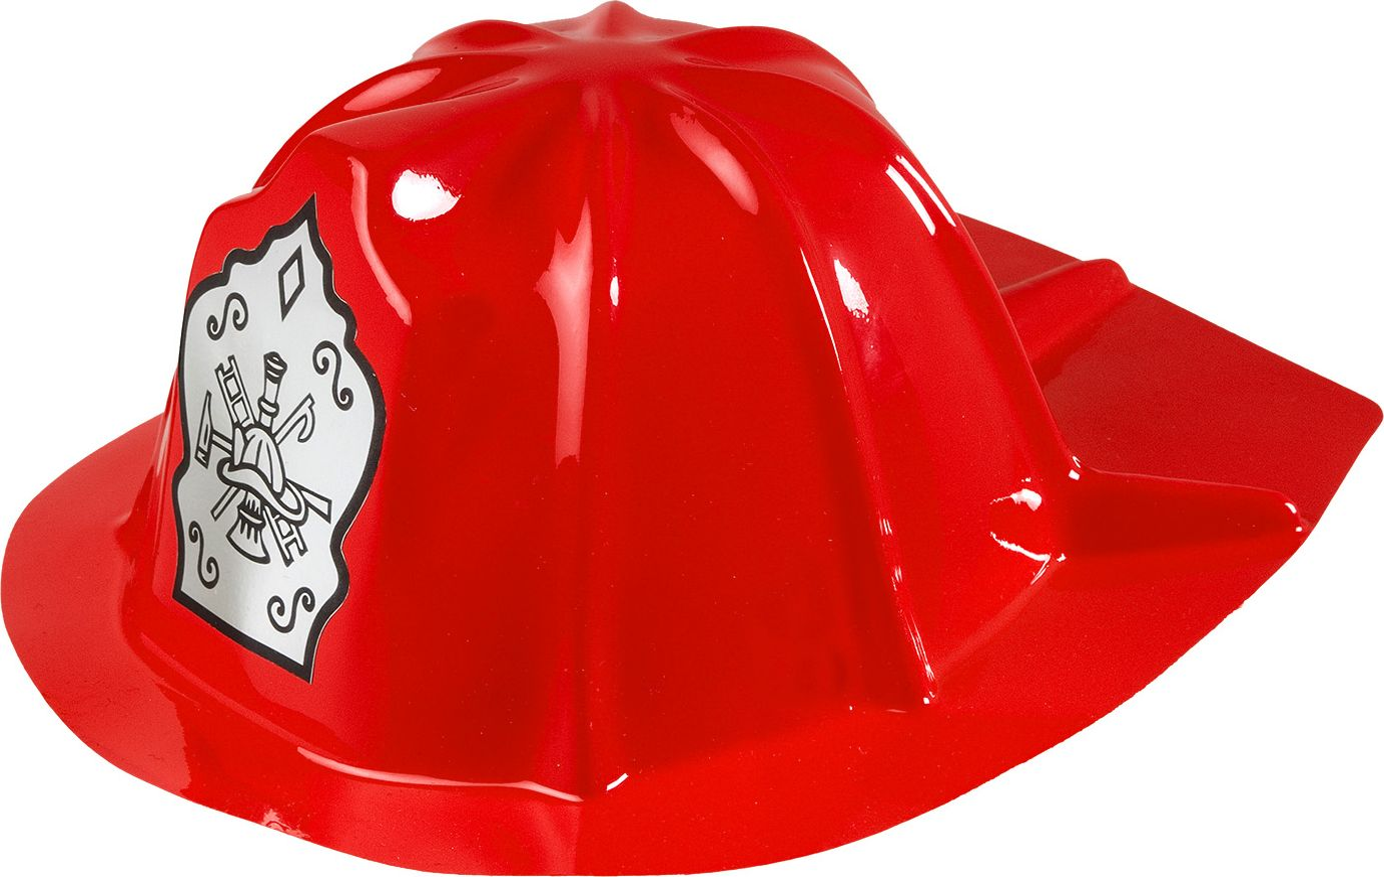 Rode brandweer helm